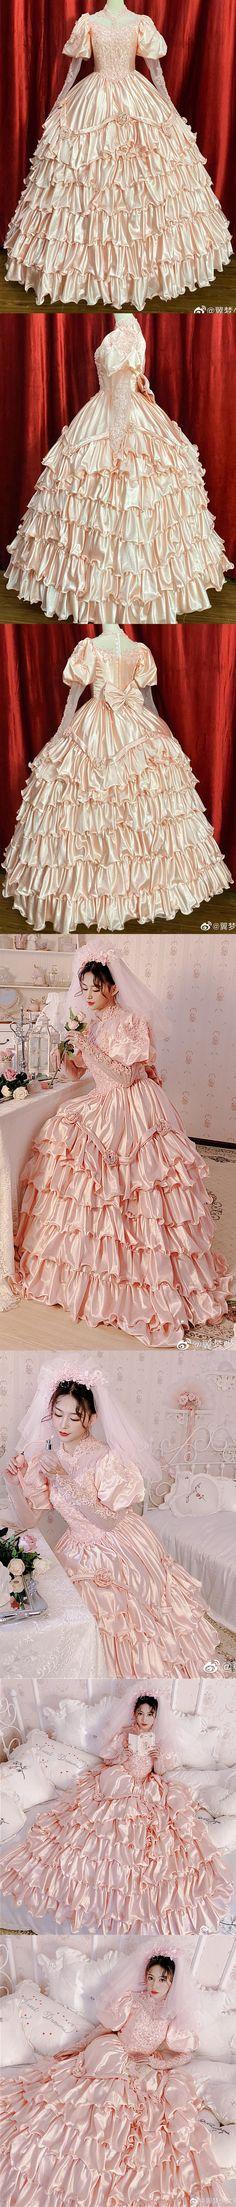 Casual Attire, Femininity, Pretty Dresses, Women Wear, Prom Dresses, Magic, Gowns, Vestidos, Cute Dresses